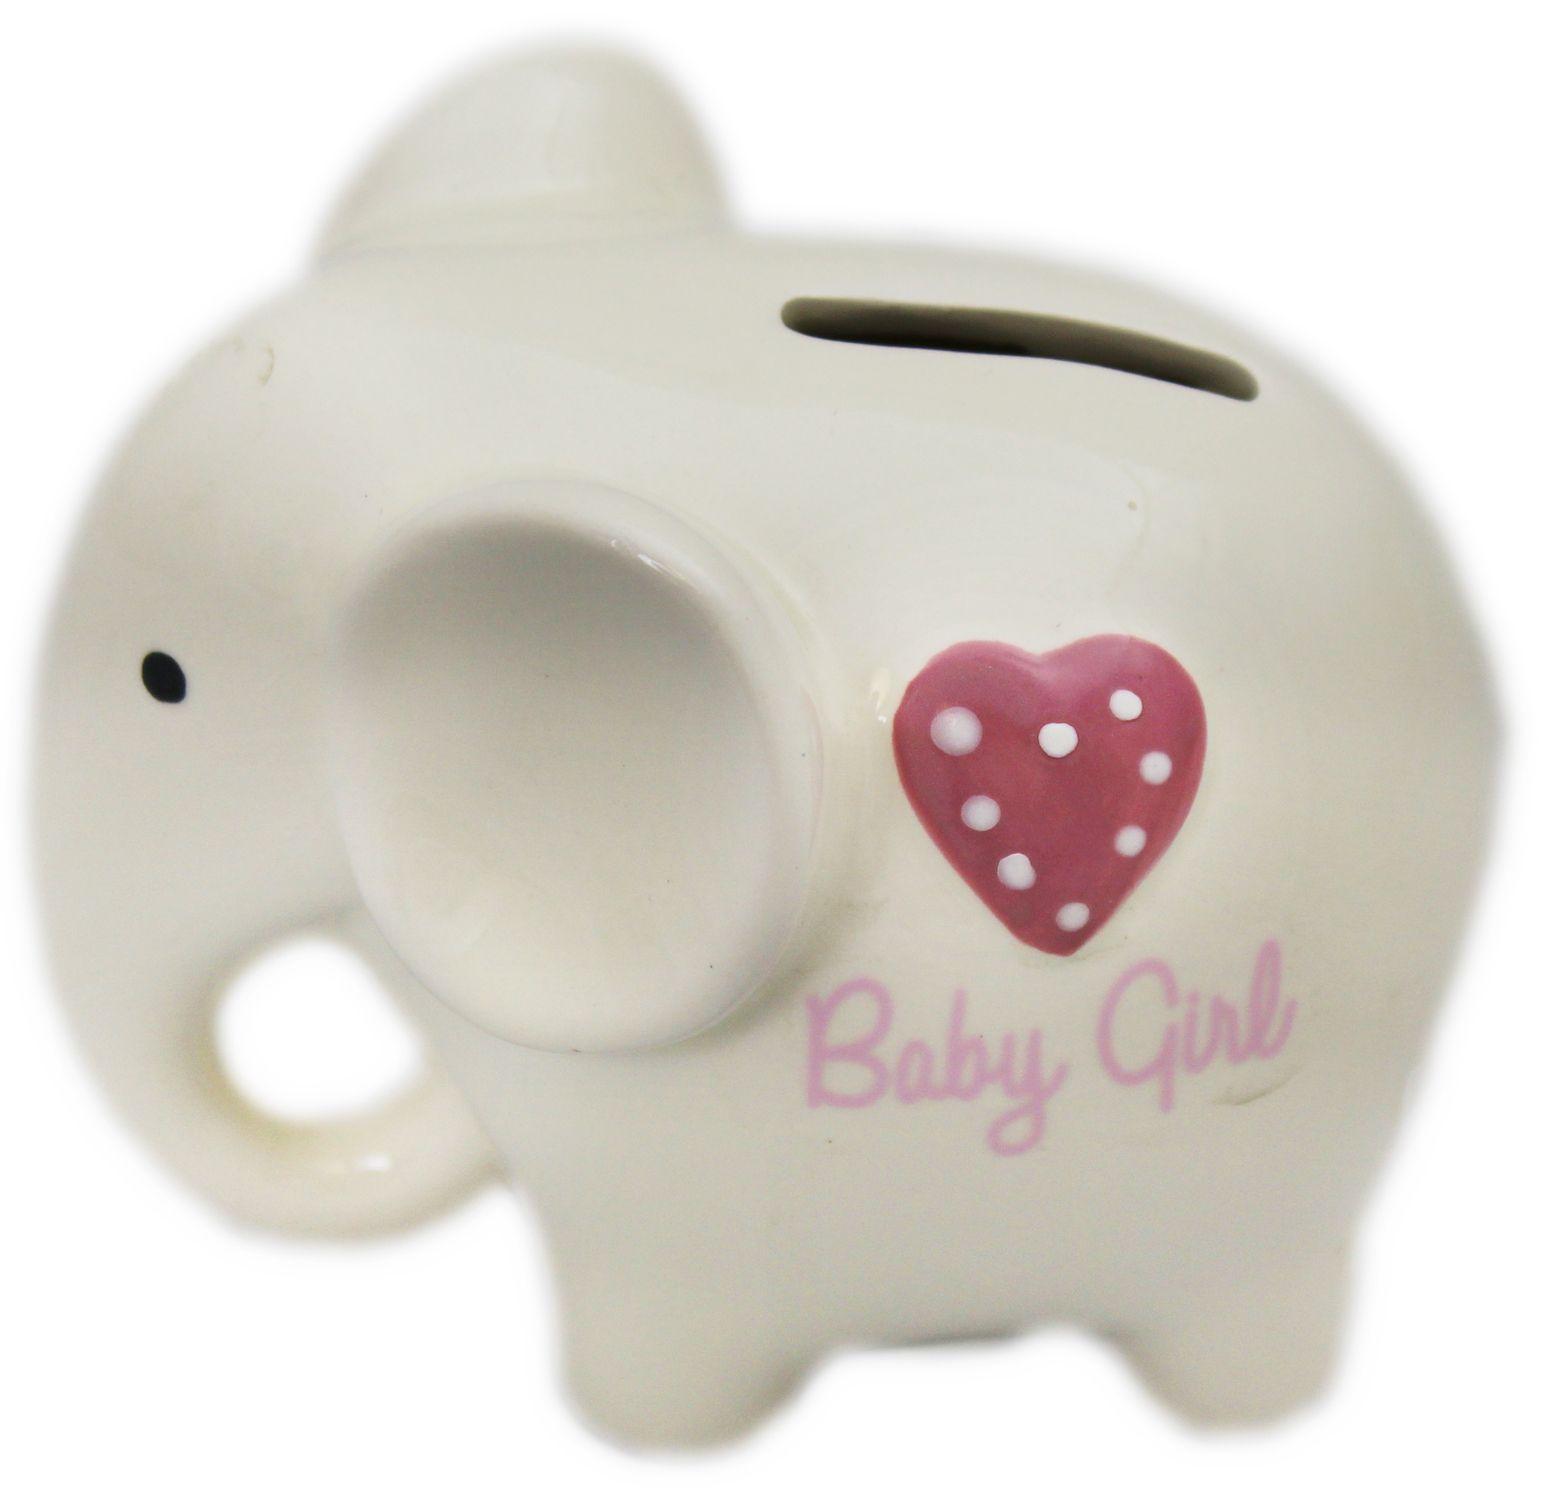 Glazed ceramic baby elephant money box piggy bank baby girl pink heart ebay - Ceramic elephant piggy bank ...